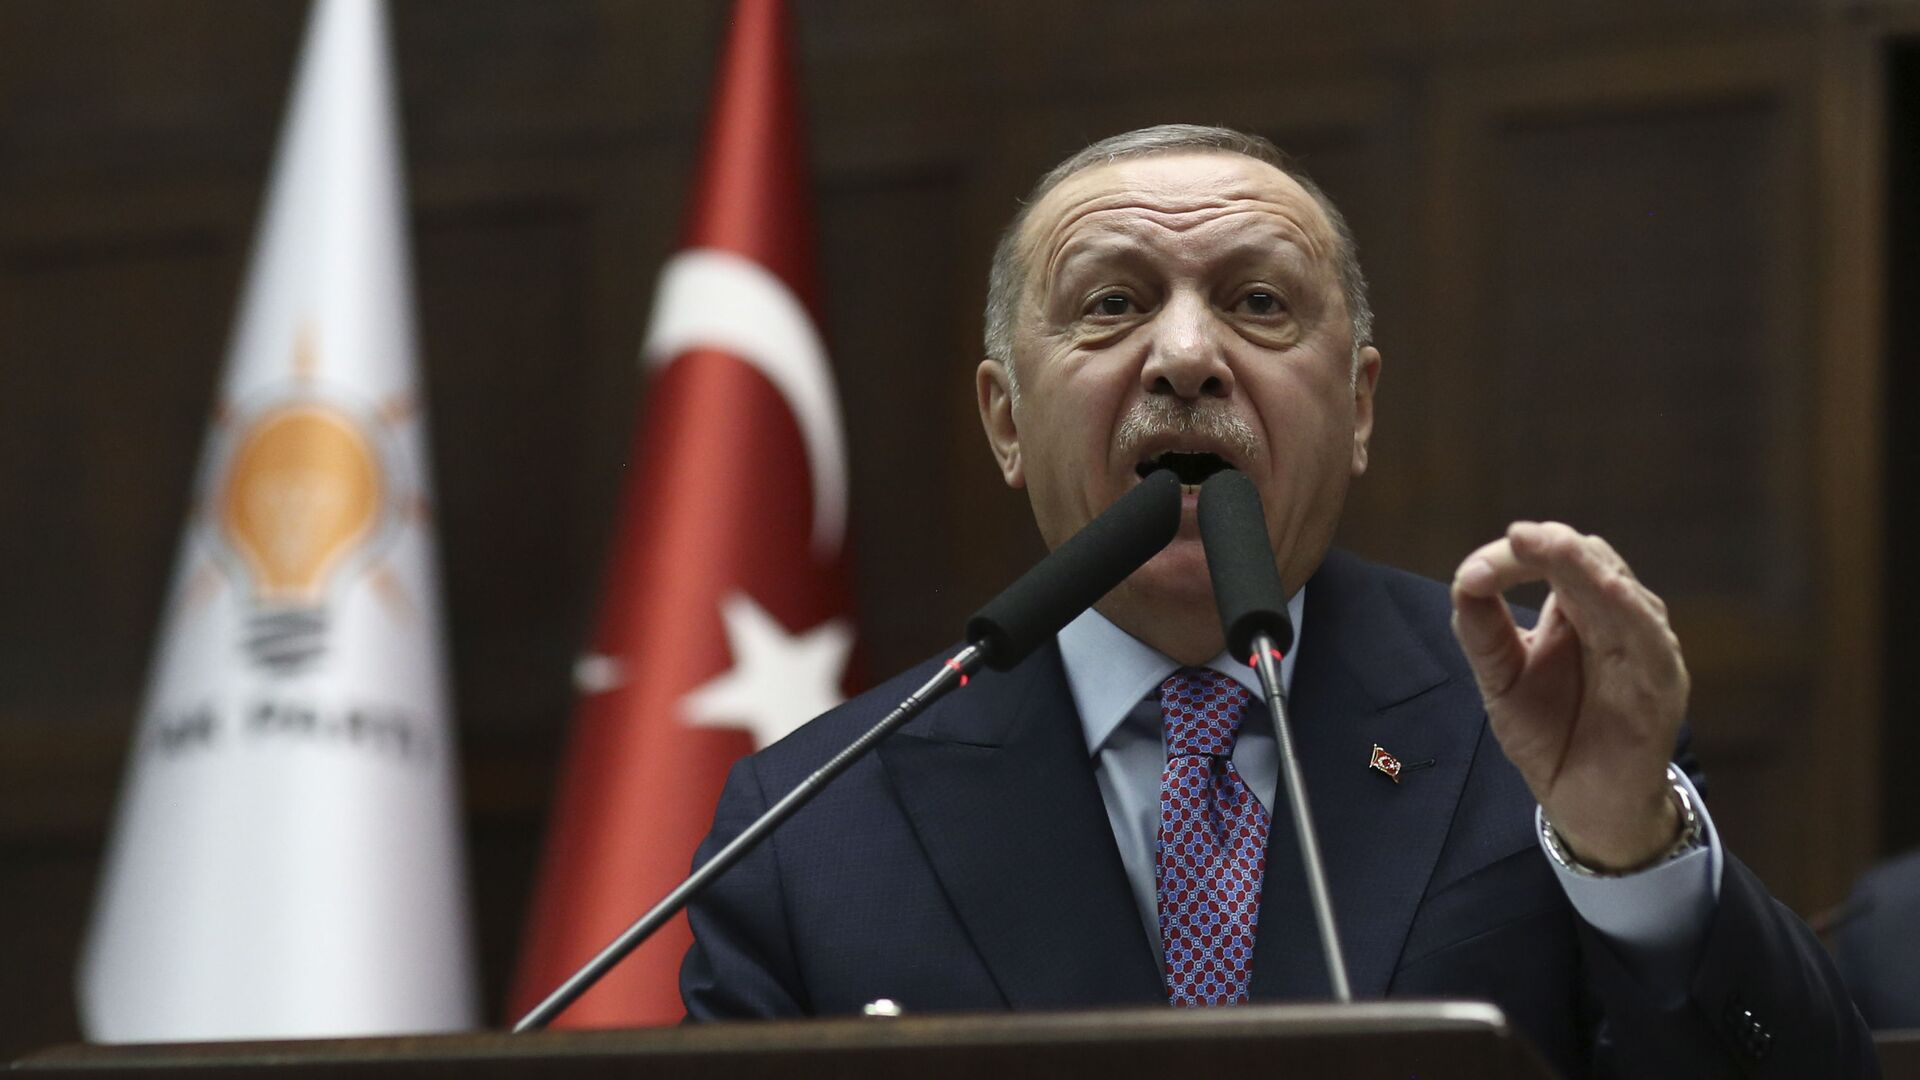 Президент Турции Реджеп Эрдоган - Sputnik Тоҷикистон, 1920, 09.09.2021